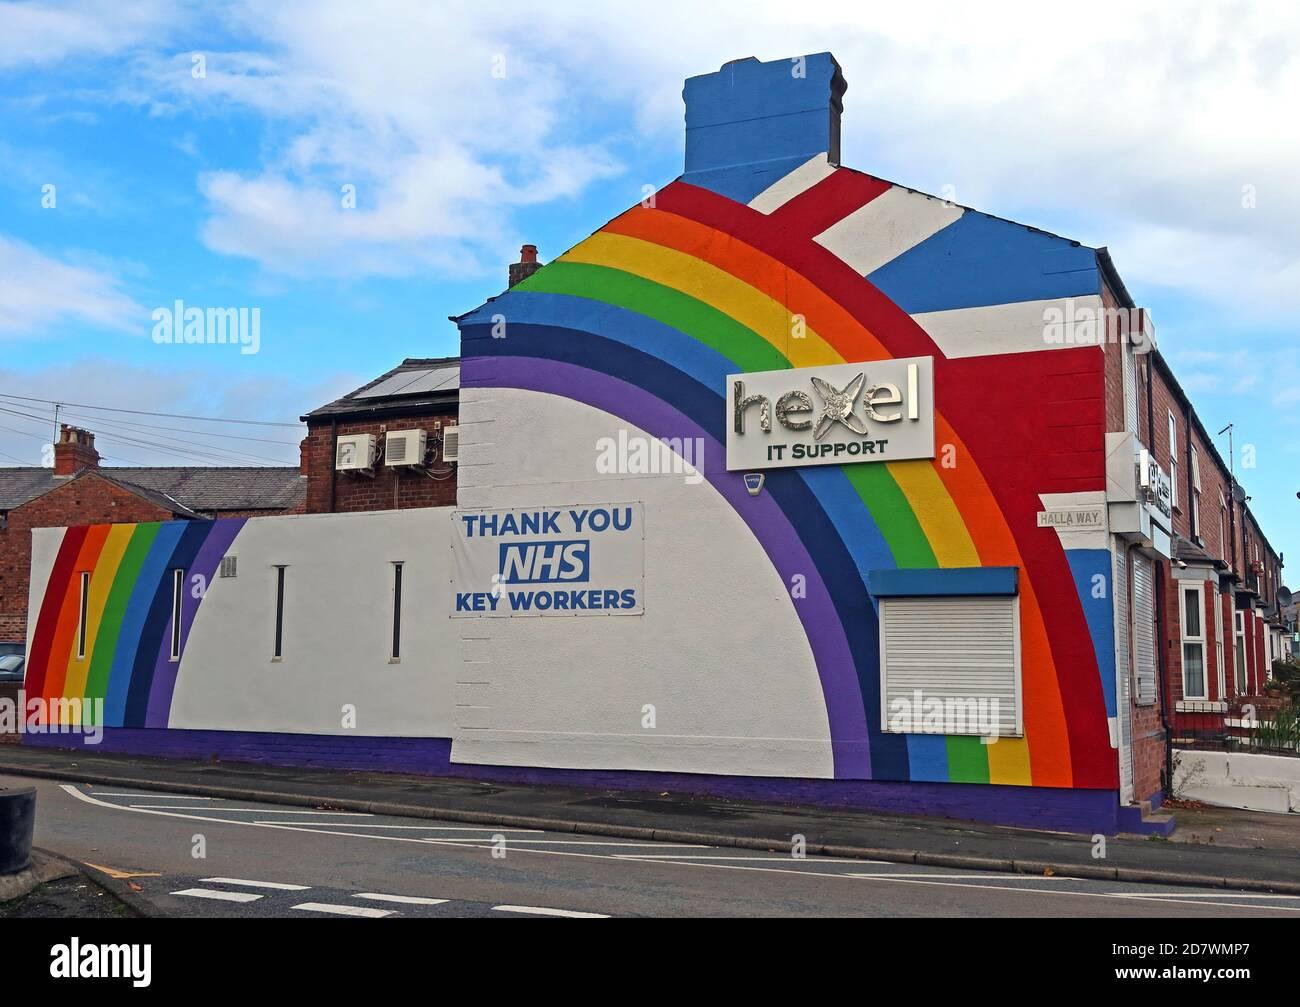 Dieses Stockfoto: Hexel IT Support, Giebel End, vielen Dank NHS Key Workers, rainbow, Latchford, Warrington, Cheshire, England, Großbritannien, WA4 - 2D7WMP